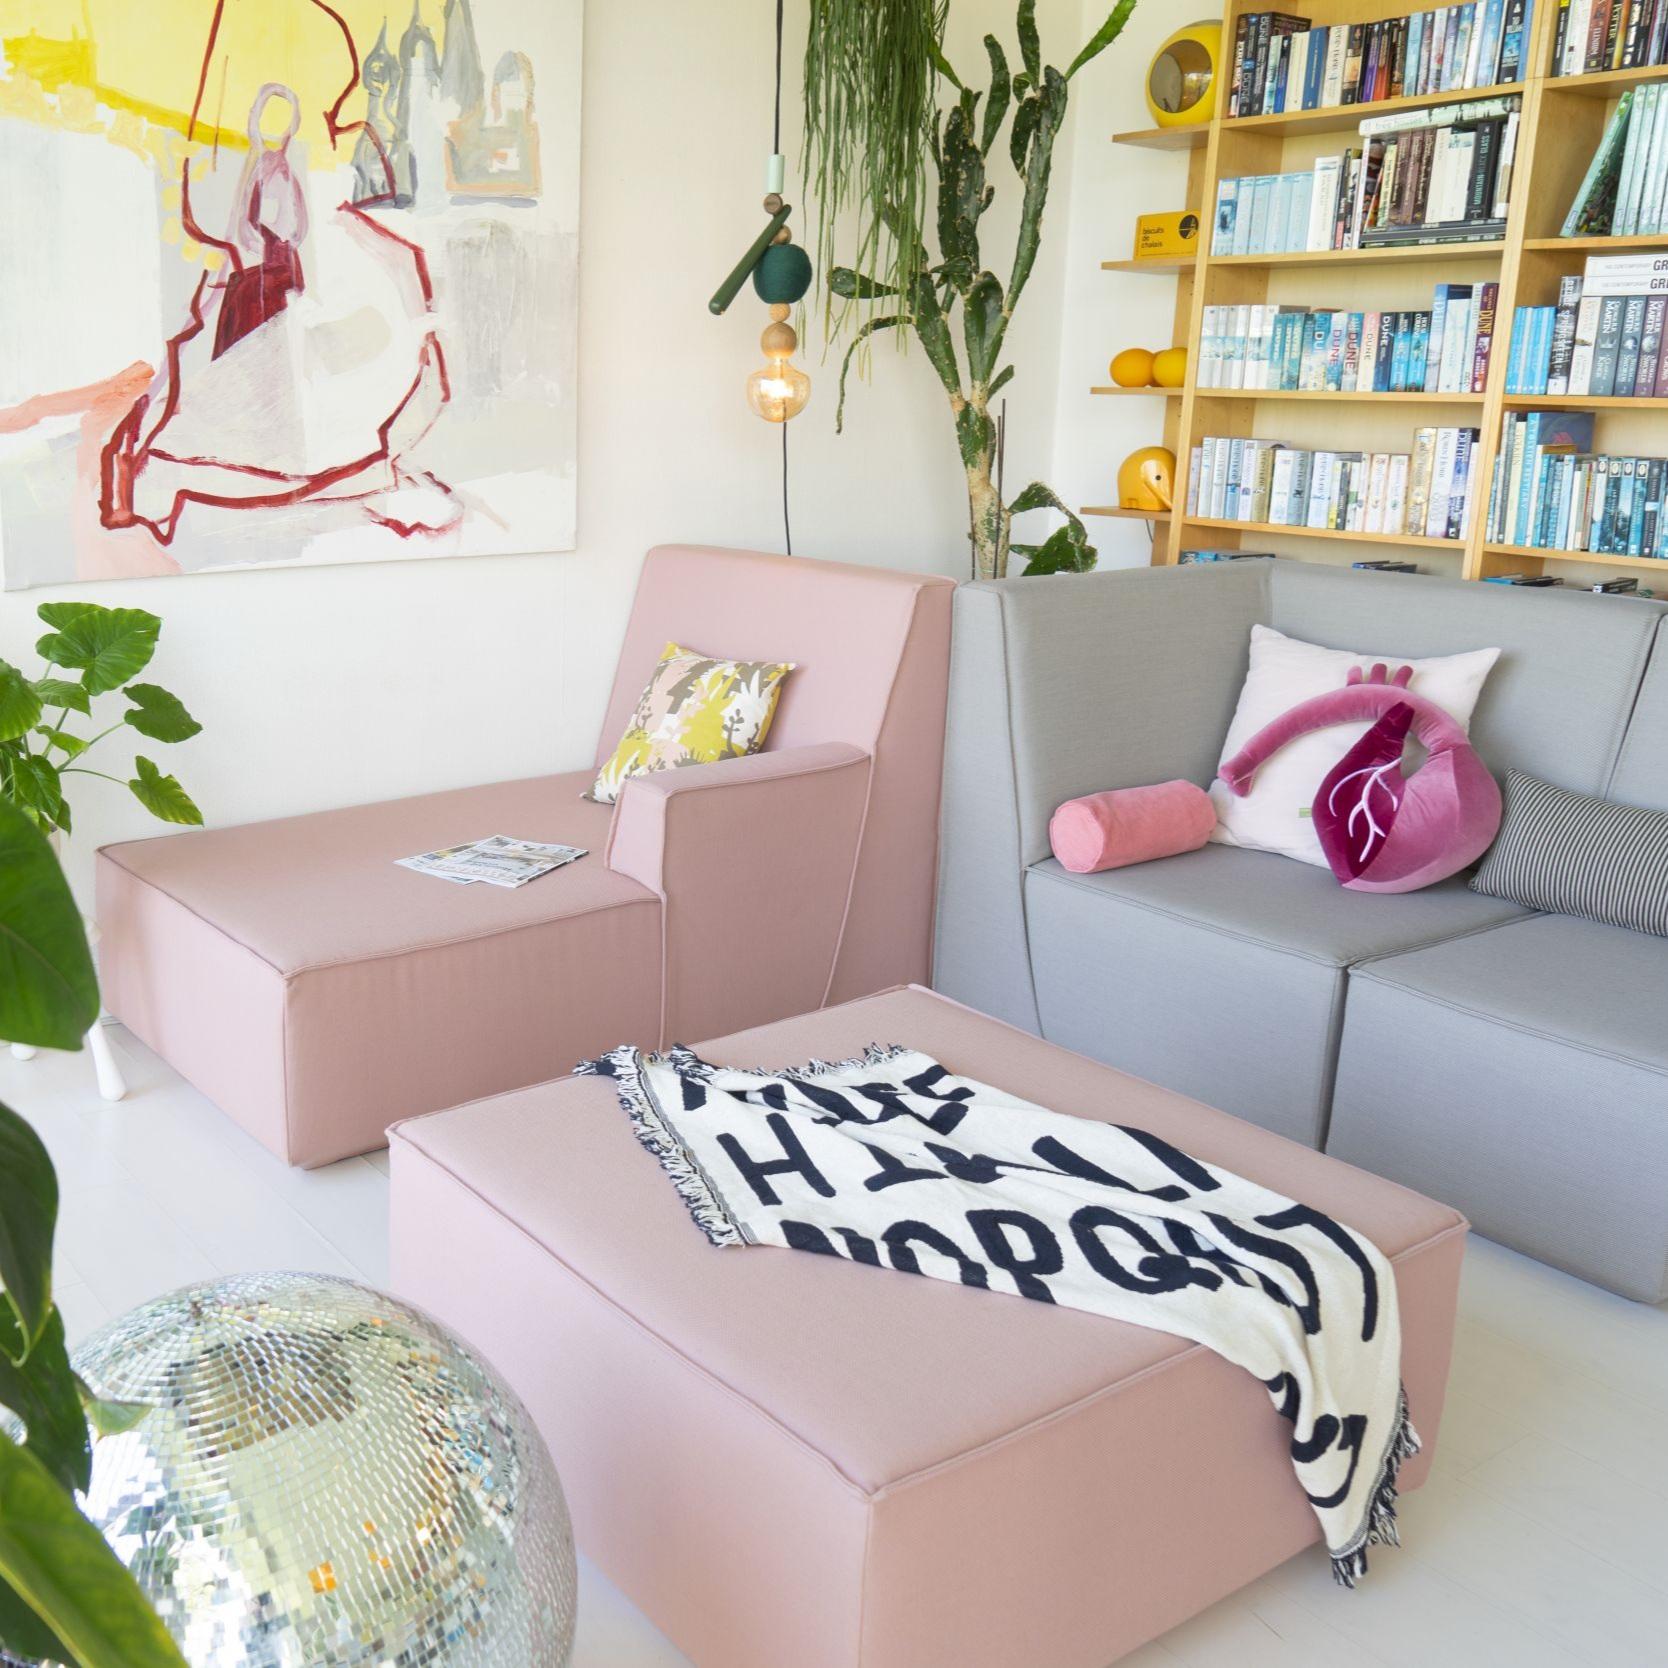 joelix-cubit-modular-sofa-couch-pink-20 (1).jpg